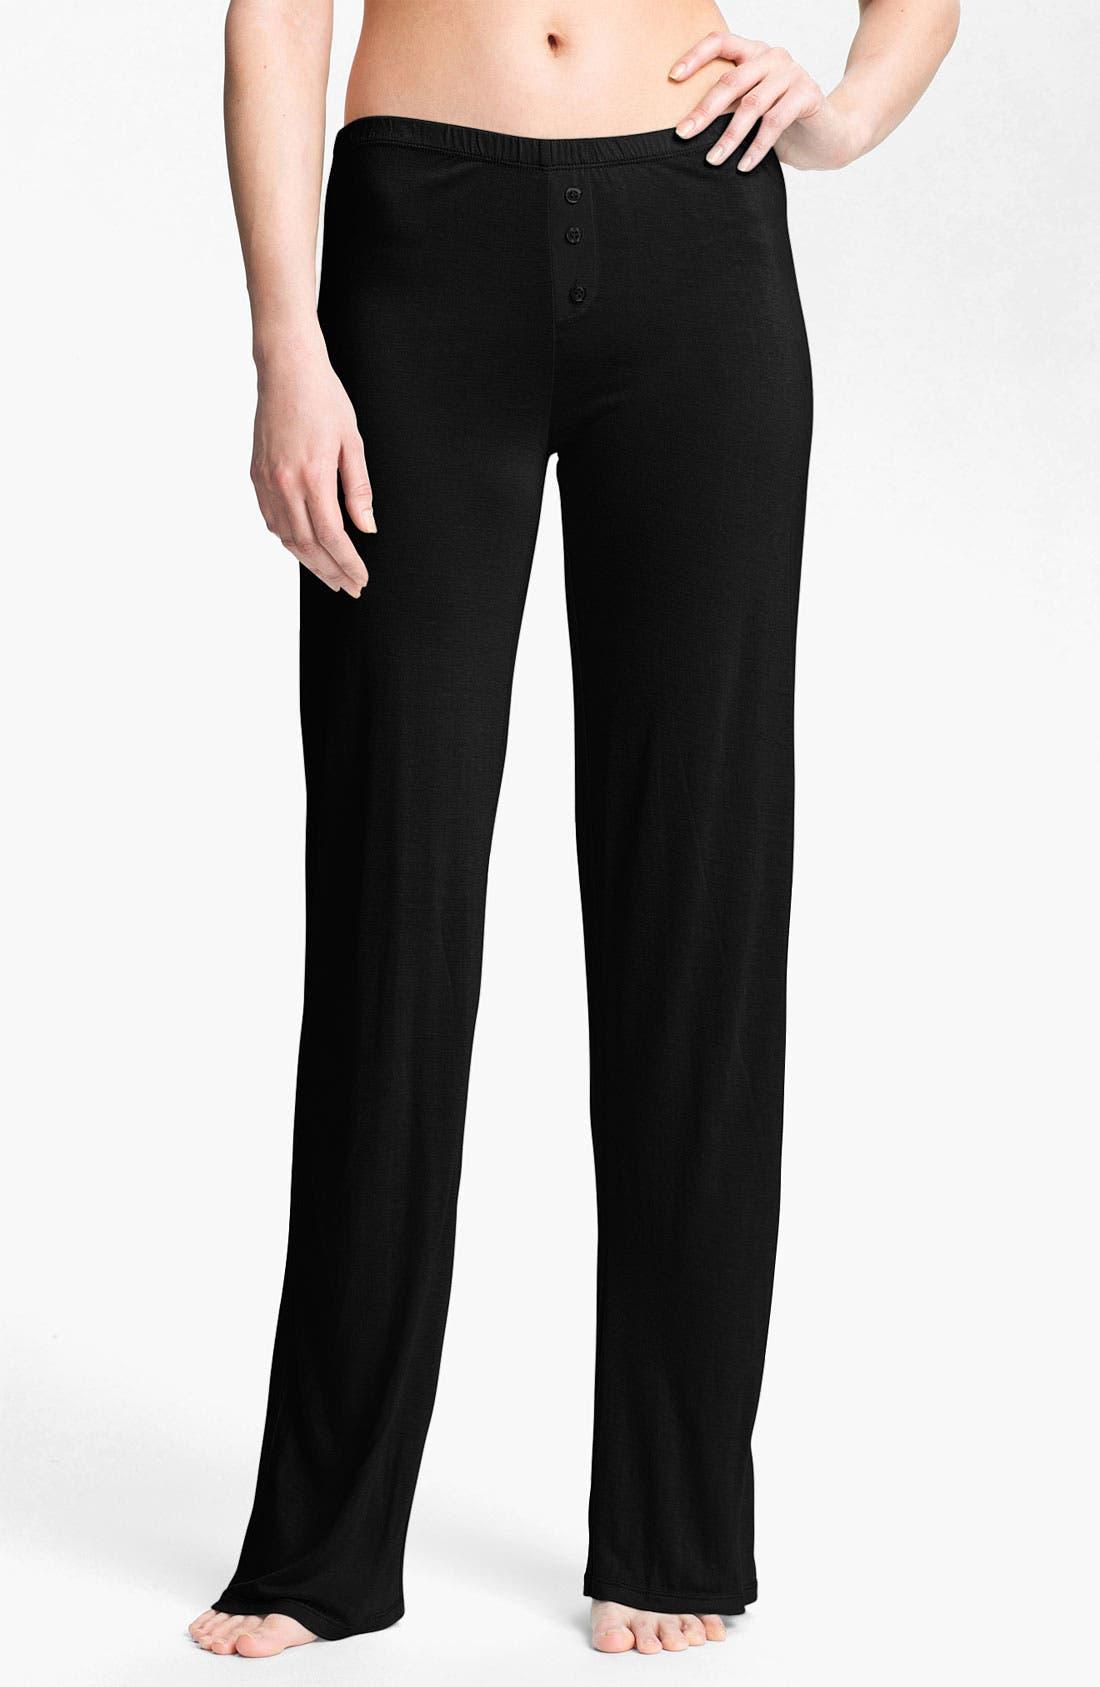 Alternate Image 1 Selected - PJ Salvage 'Rayon Basics' Pants